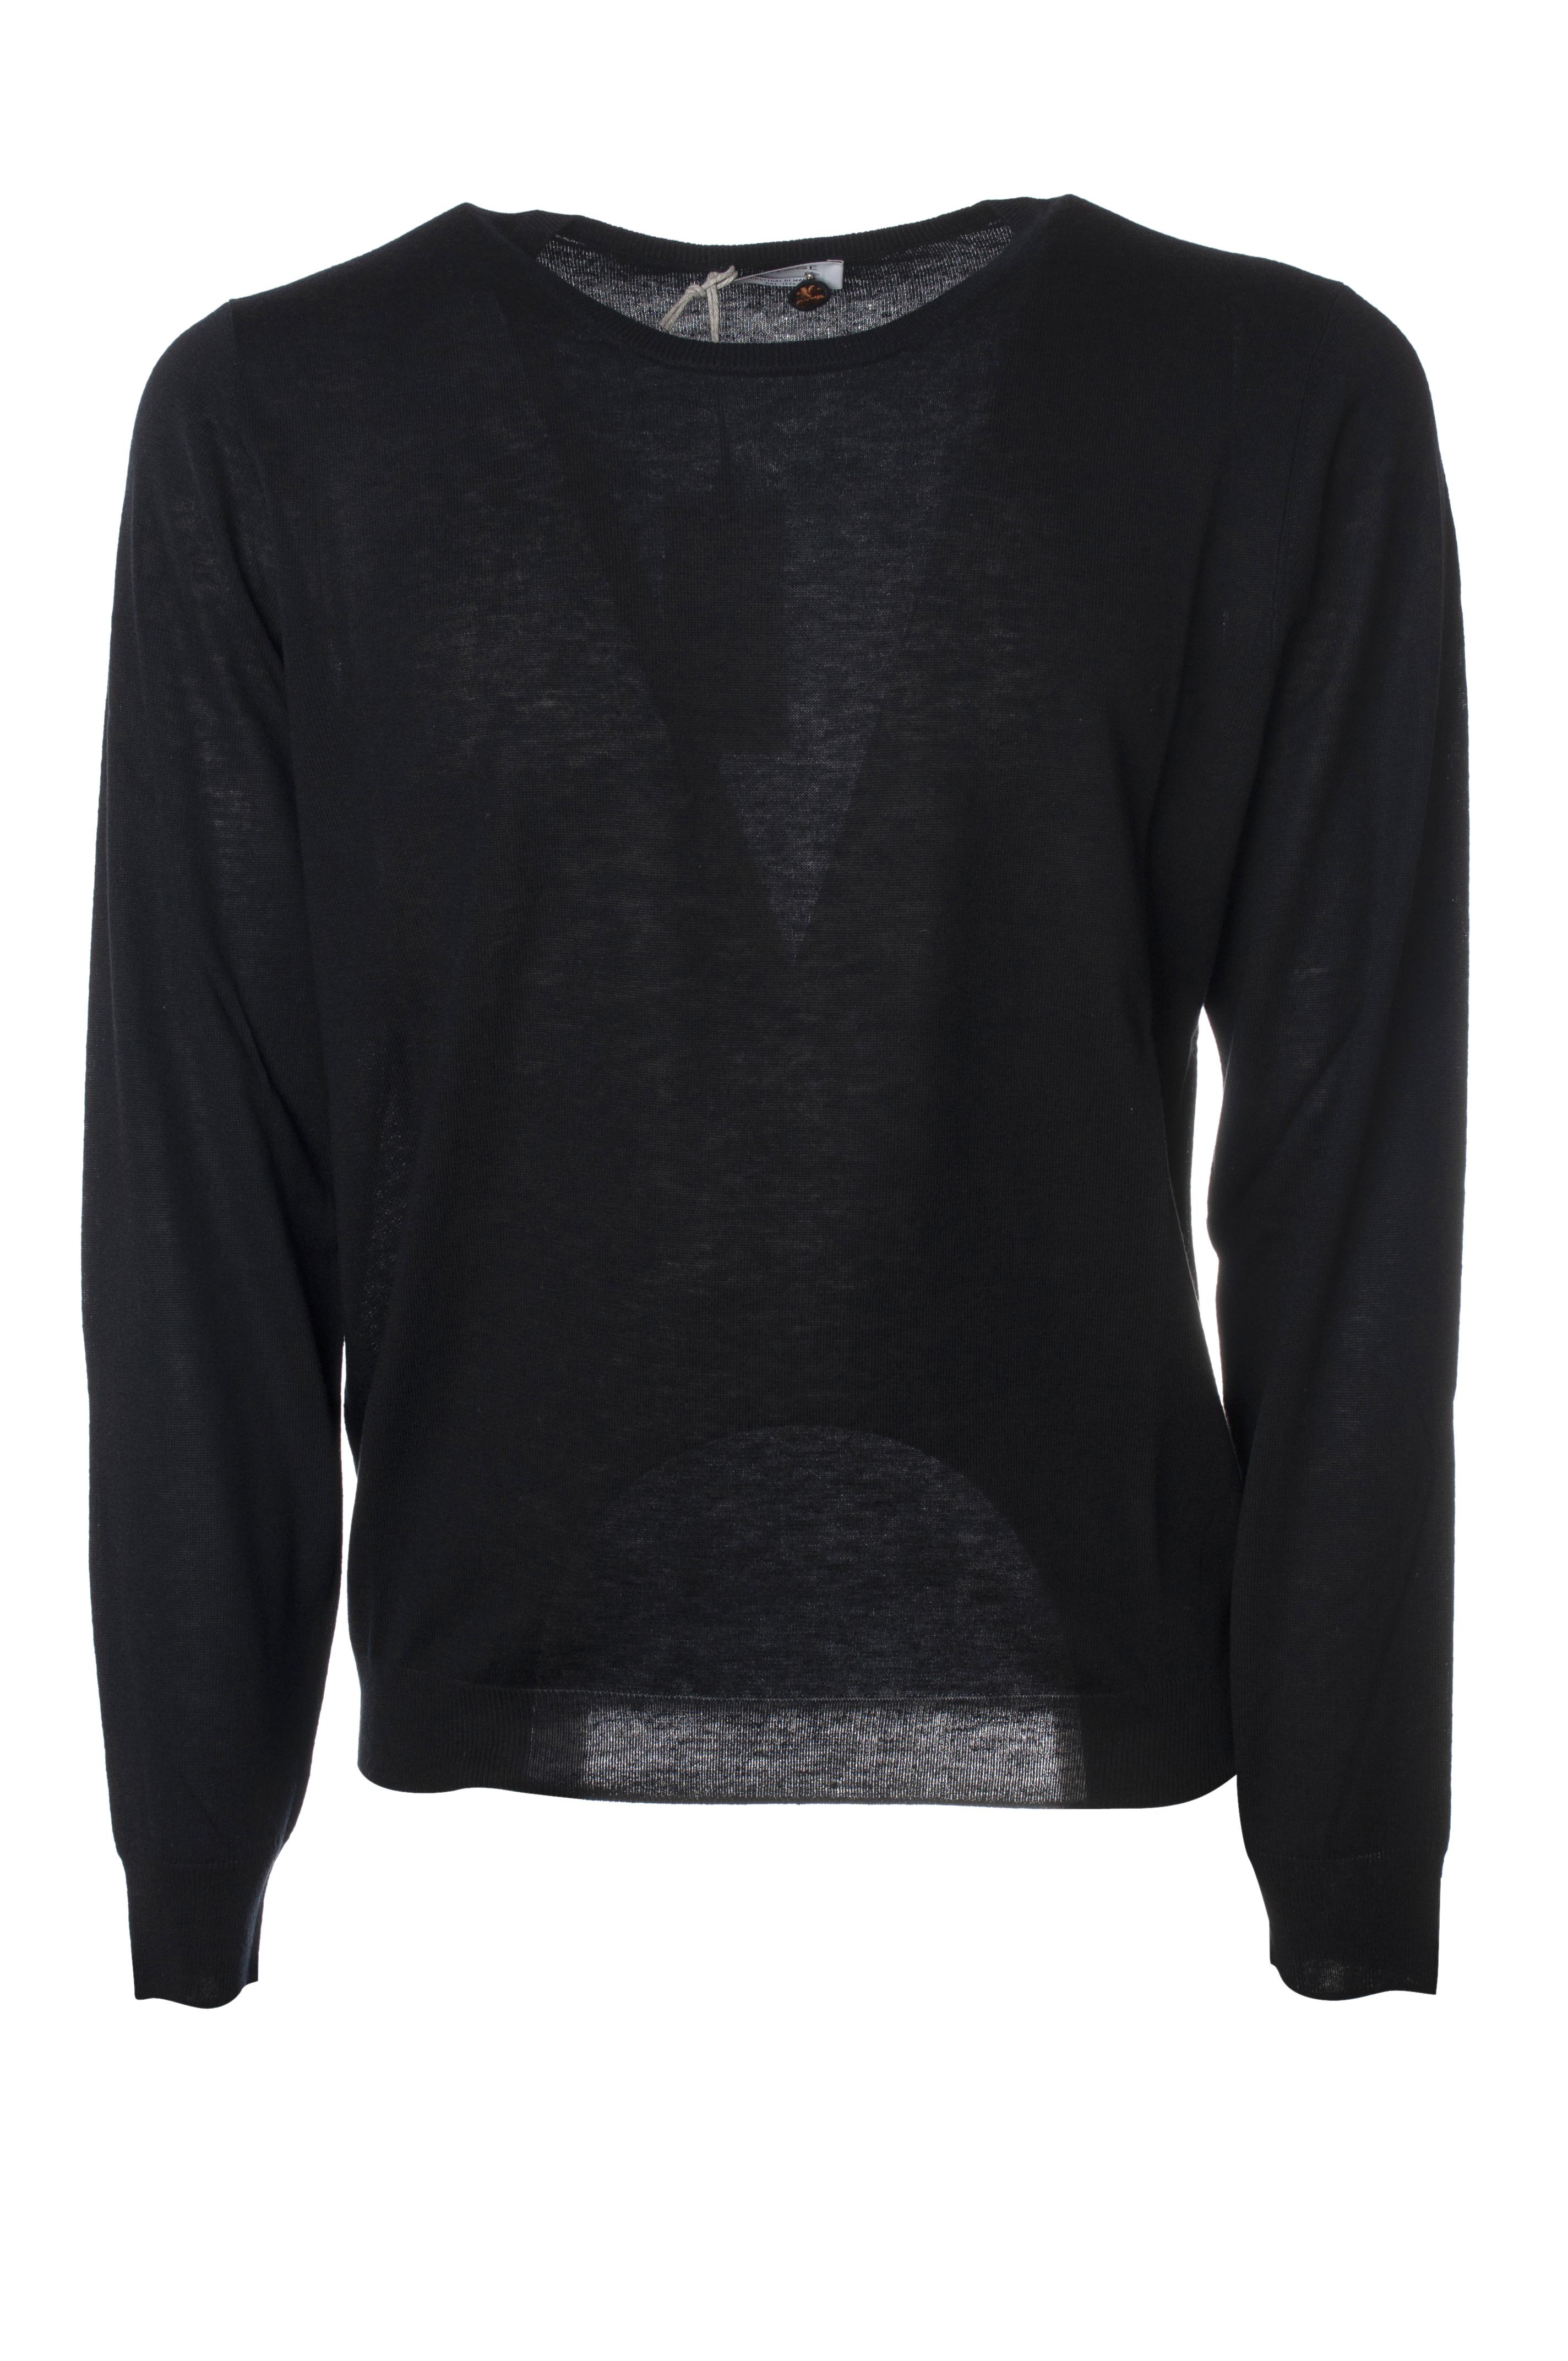 Heritage - Knitwear-schweißers - Man - Blau - 5836913D191300